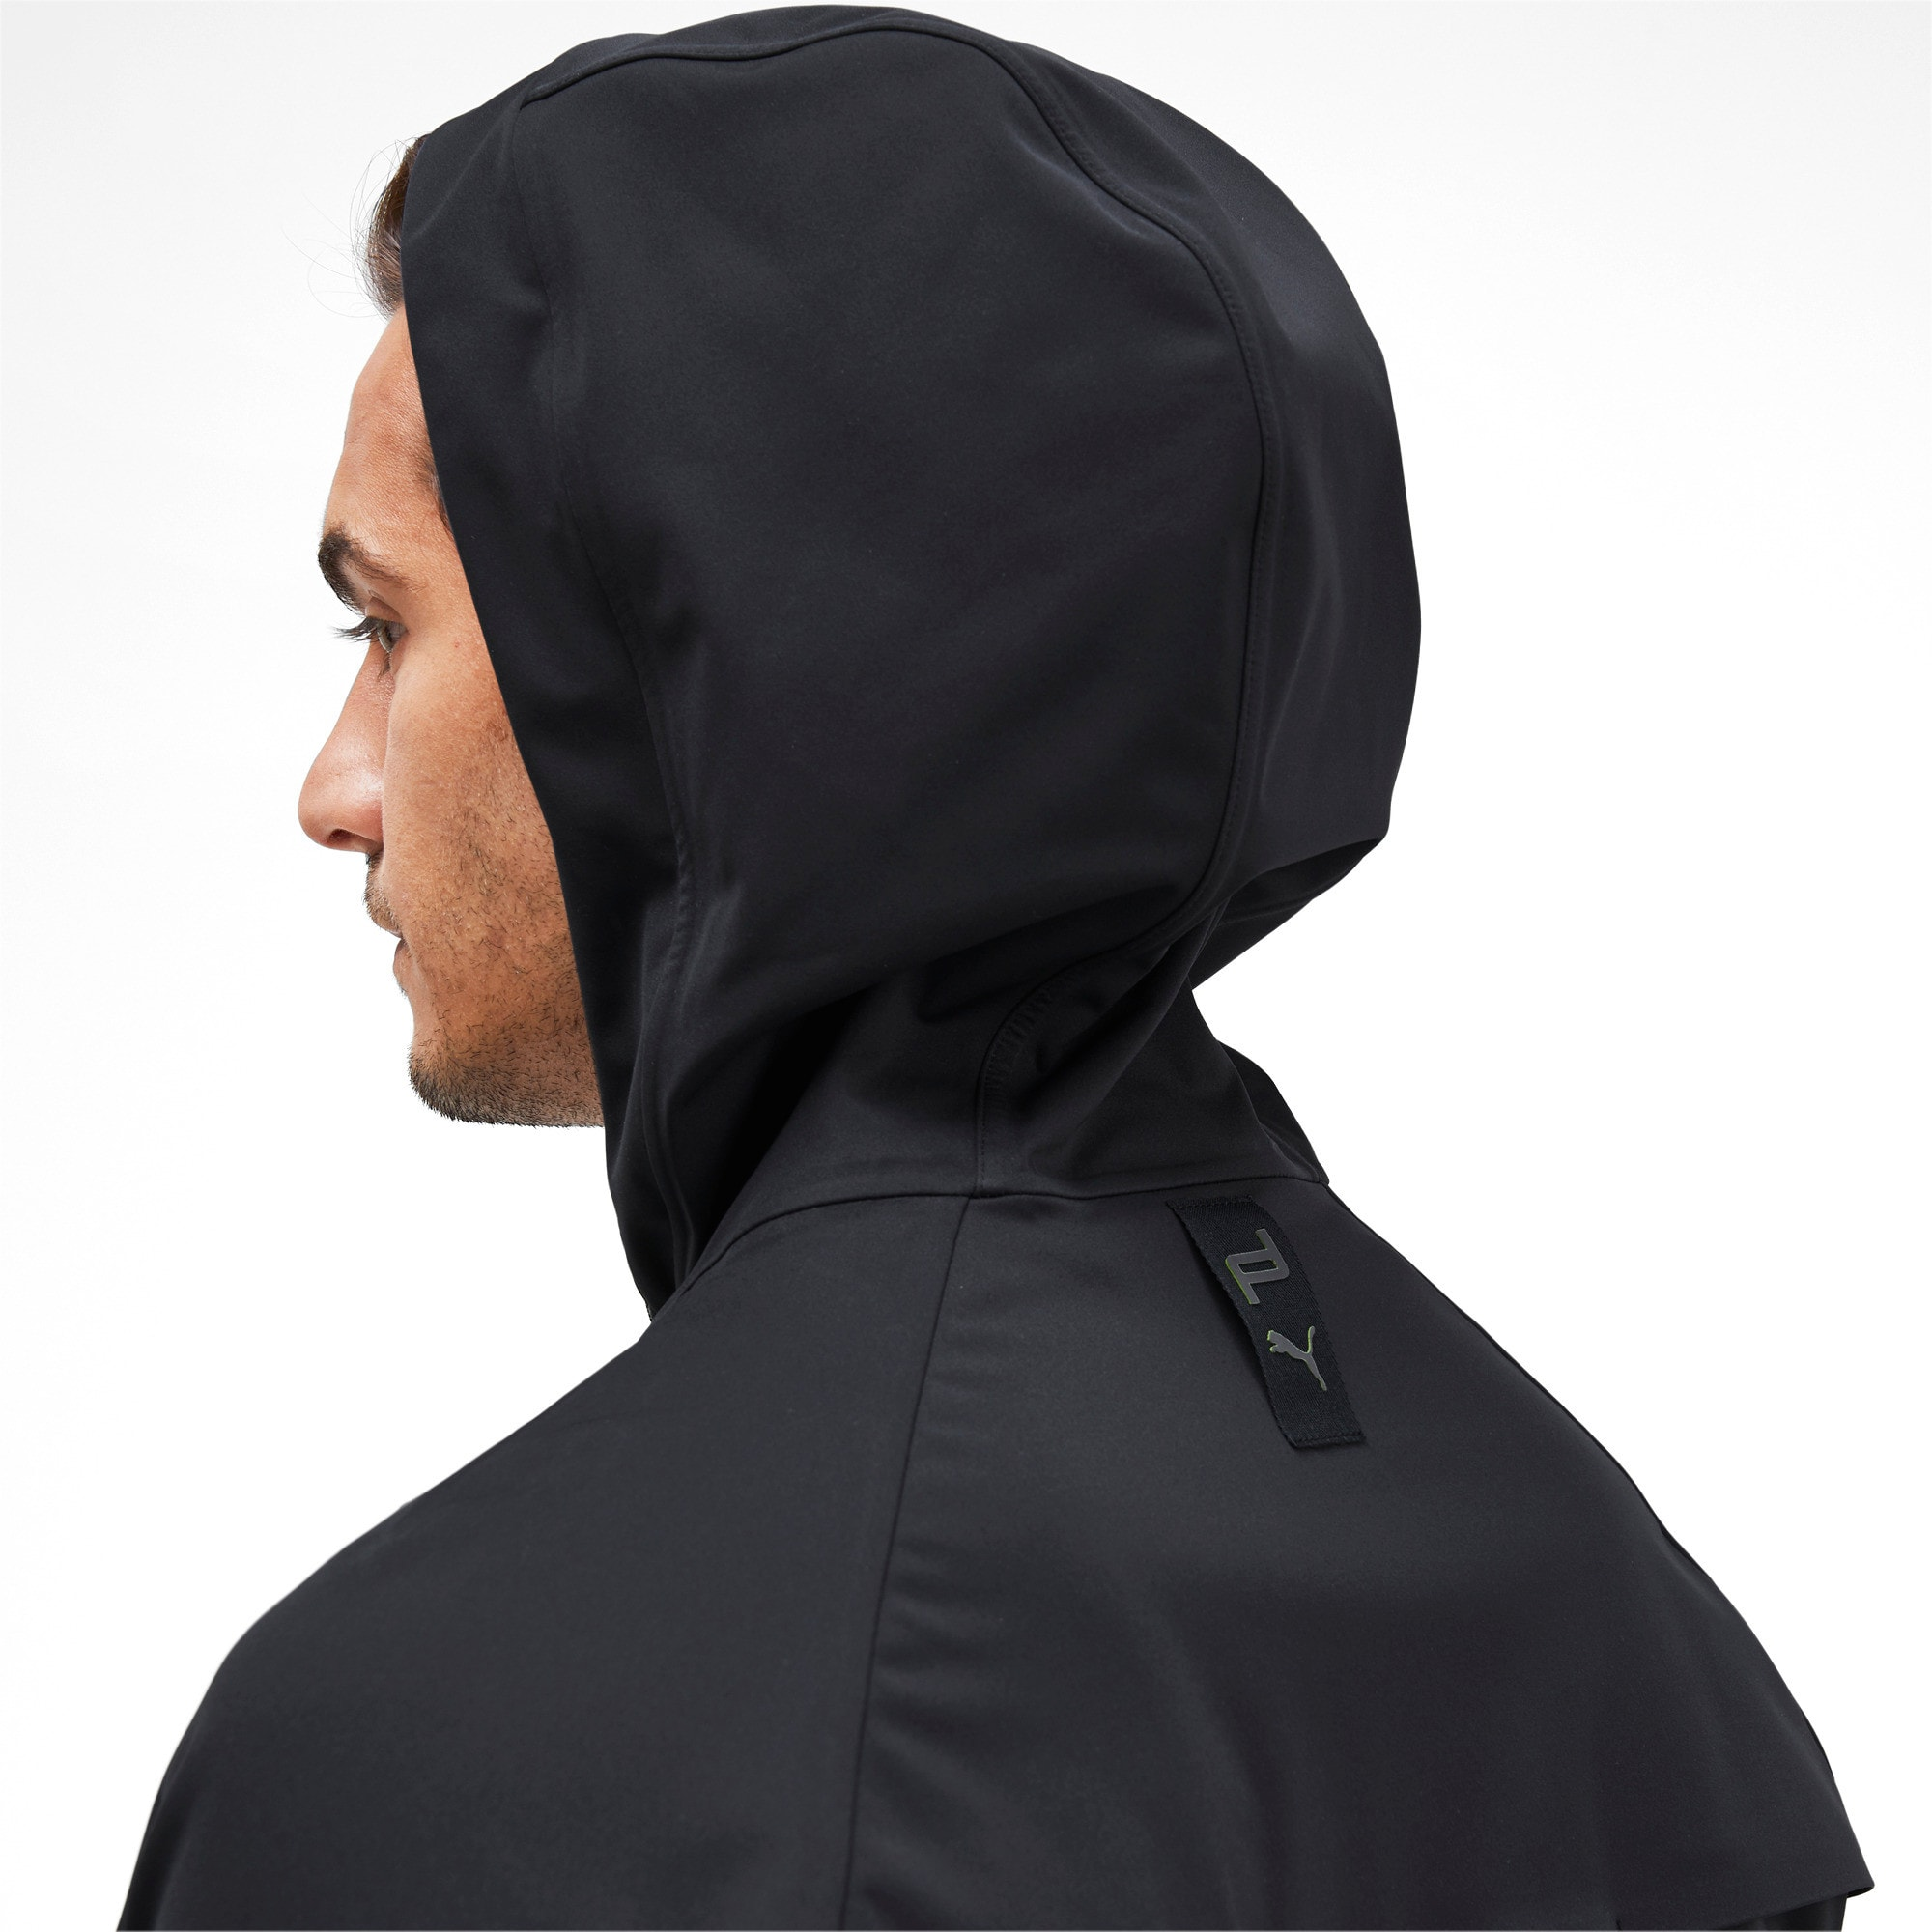 Thumbnail 7 of Porsche Design Active All Day Men's Jacket, Jet Black, medium